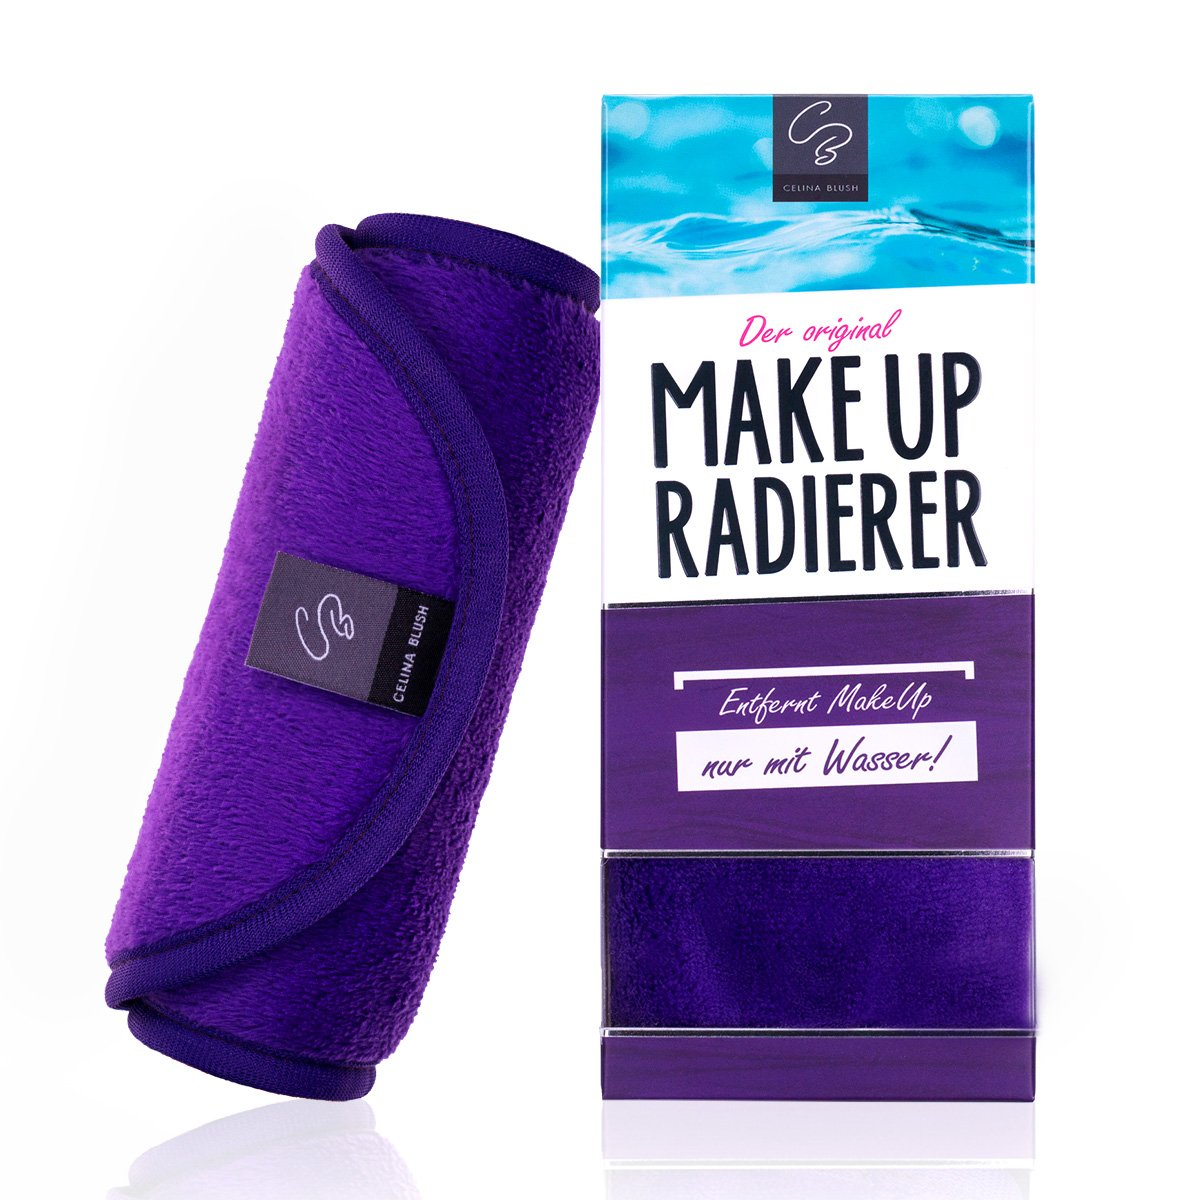 Toalla de Microfibra desmaquillante | Sólo se usa con agua | Toallitas para desmaquillaje | Makeup Eraser | Toallitas desmaquillantes y limpiadora facial | Reutilizable | Make-Up Maquillaje Remover paño | tejido facial hipoalergénico | Make Up Paños de lim